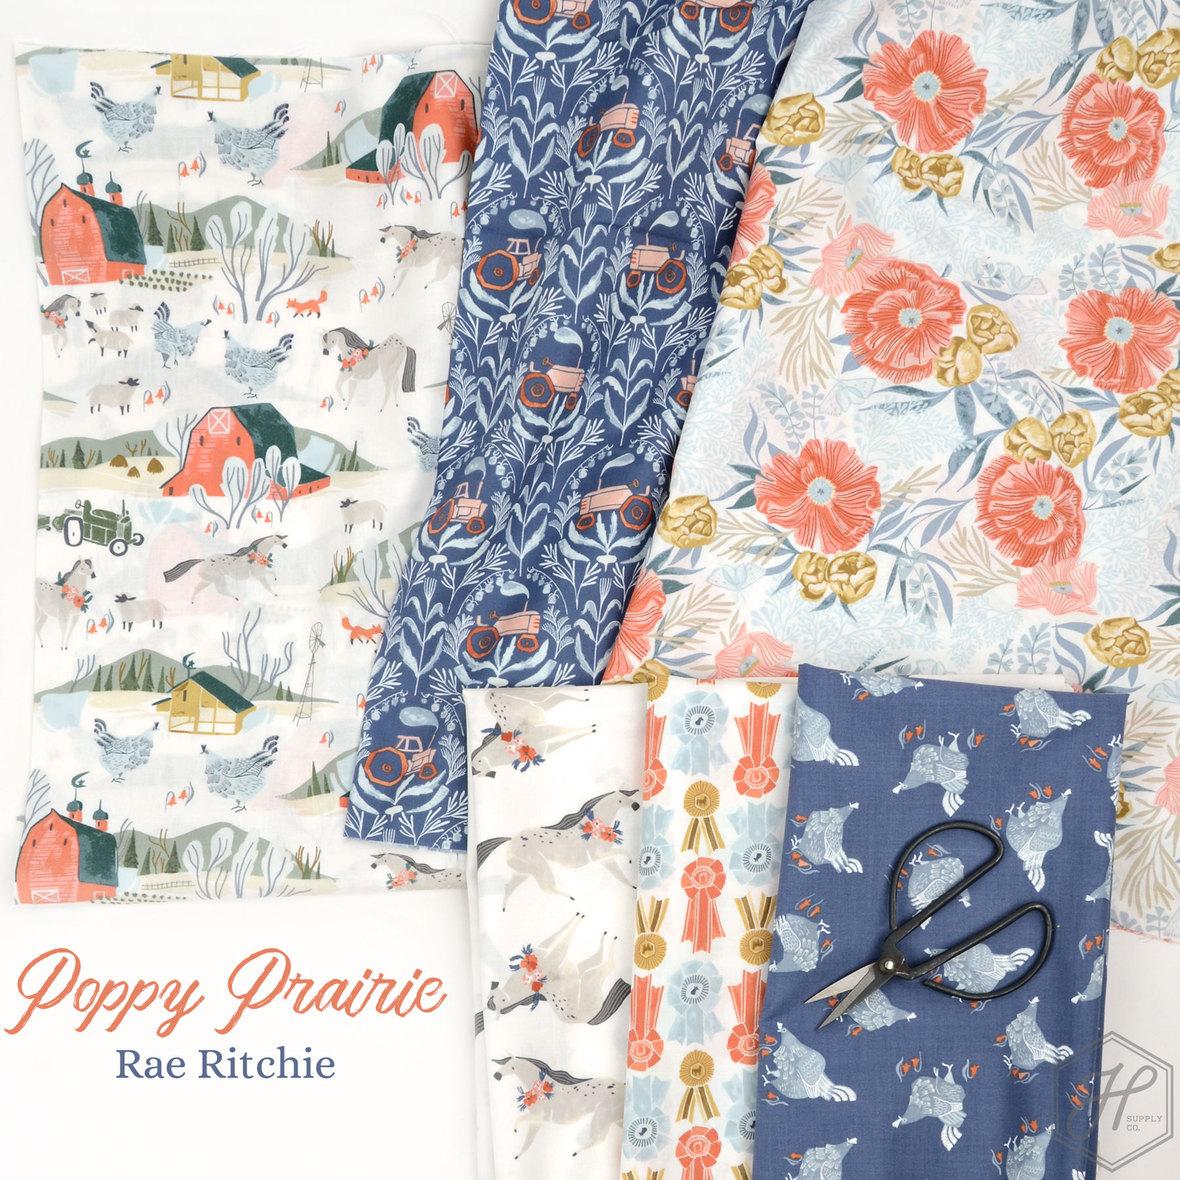 Poppy-Prairie-Fabric-Rae-Ritchie-for-Dear-Stella-at-Hawthorne-Supply-Co